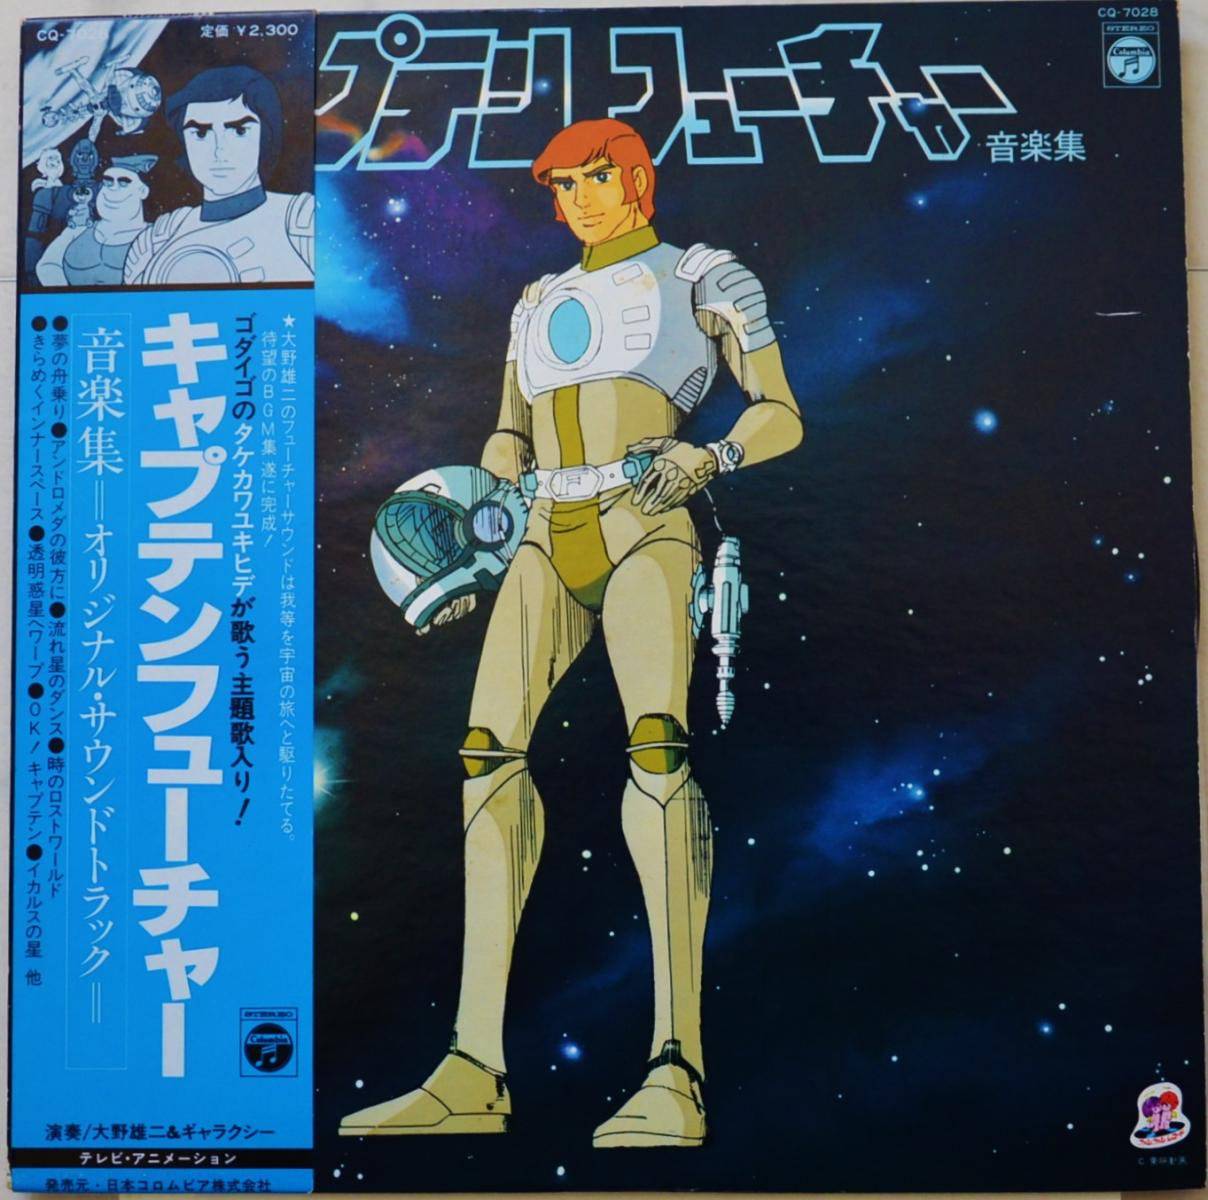 O.S.T. (大野雄二&ギャラクシー / YUJI OHNO & GALAXY) / キャプテンフューチャー音楽集 (LP)